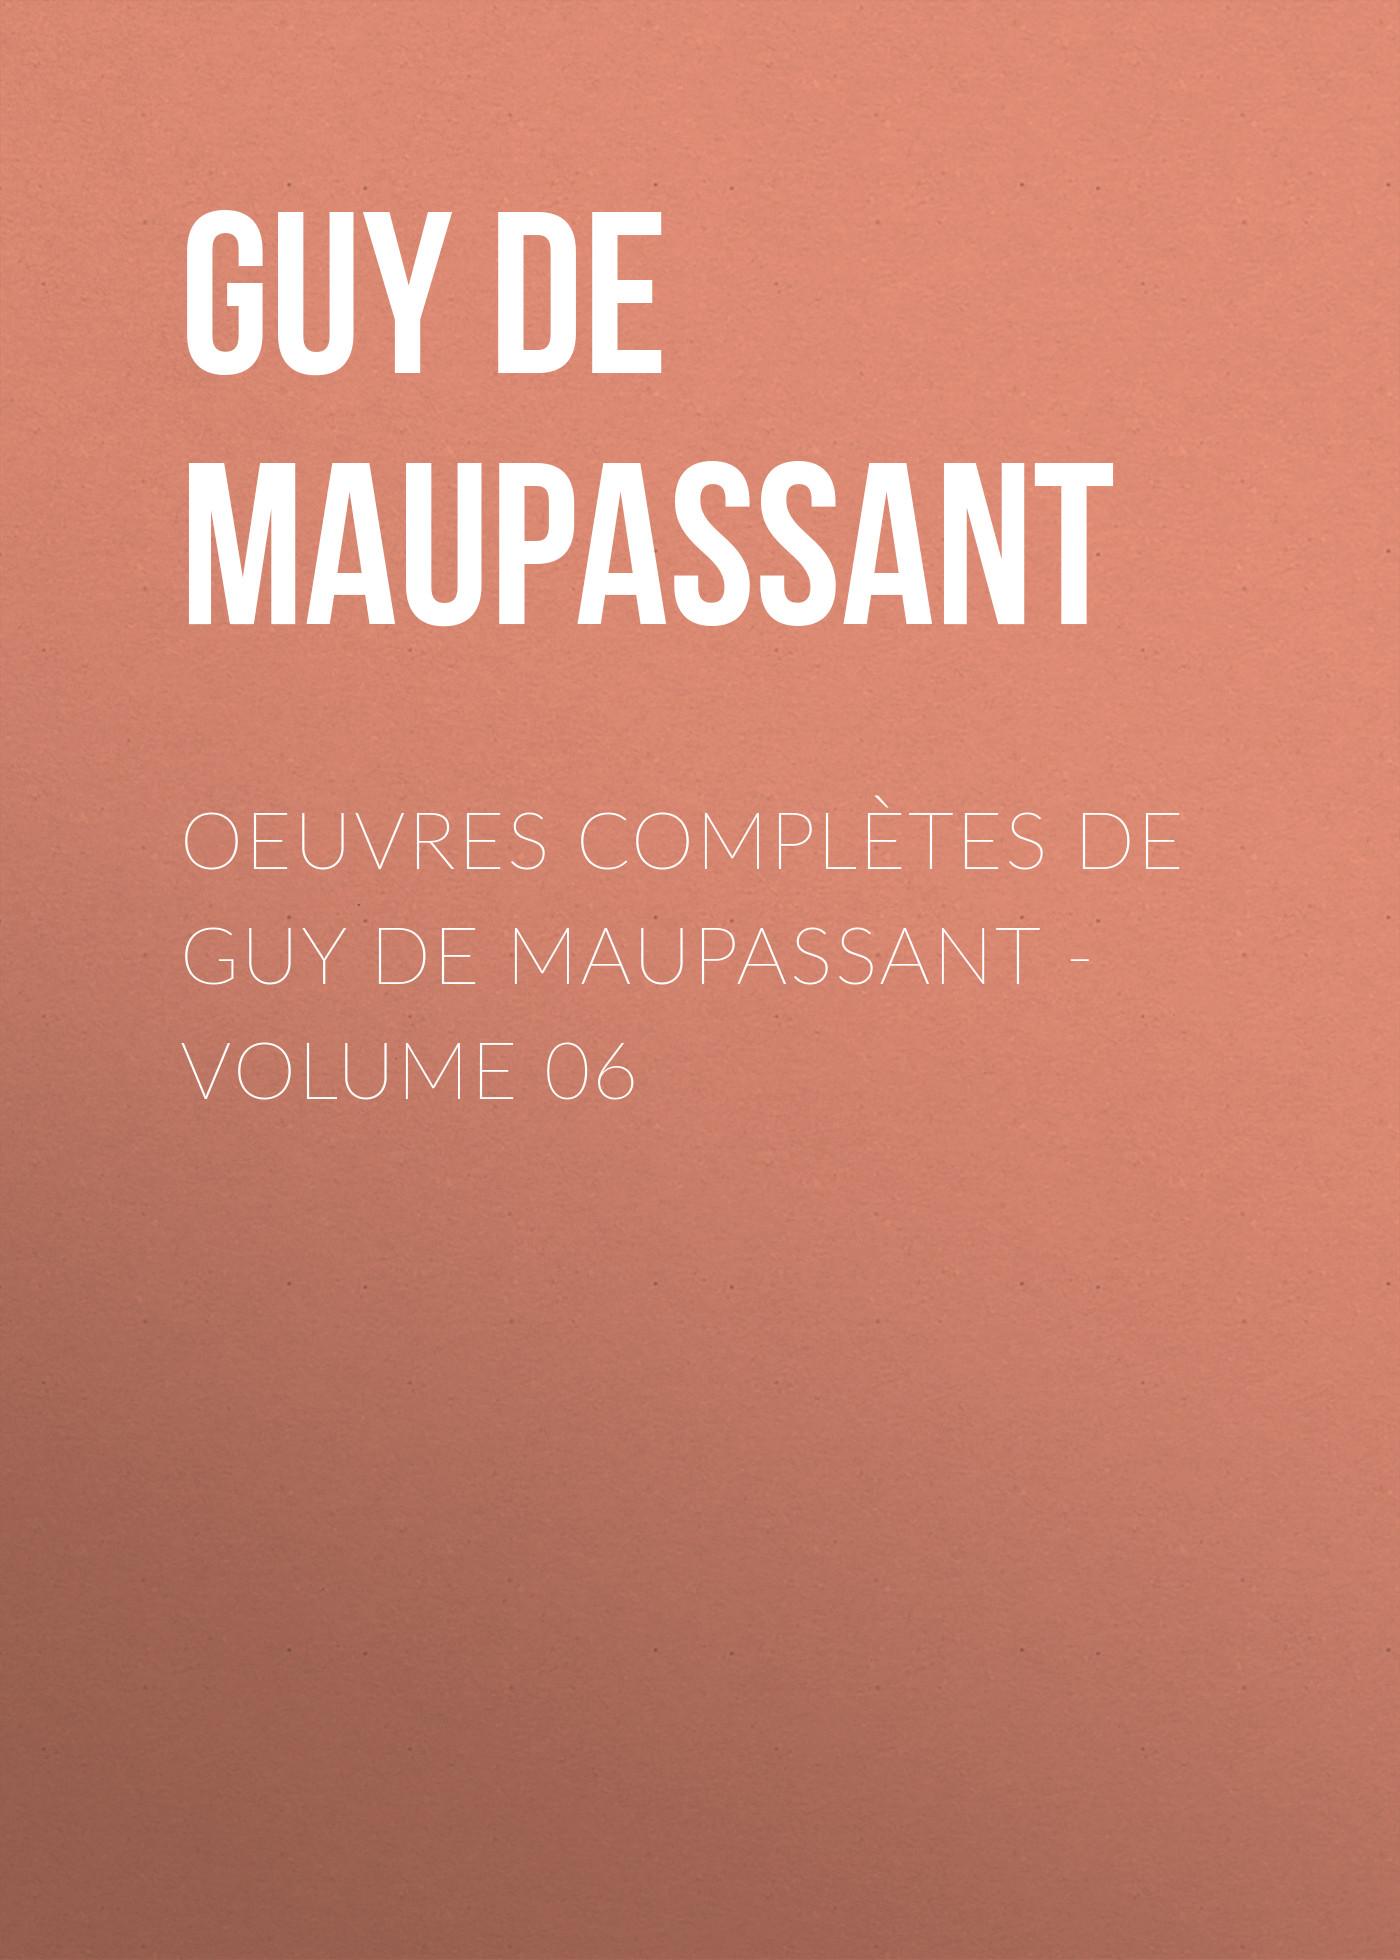 цена на Ги де Мопассан OEuvres complètes de Guy de Maupassant - volume 06